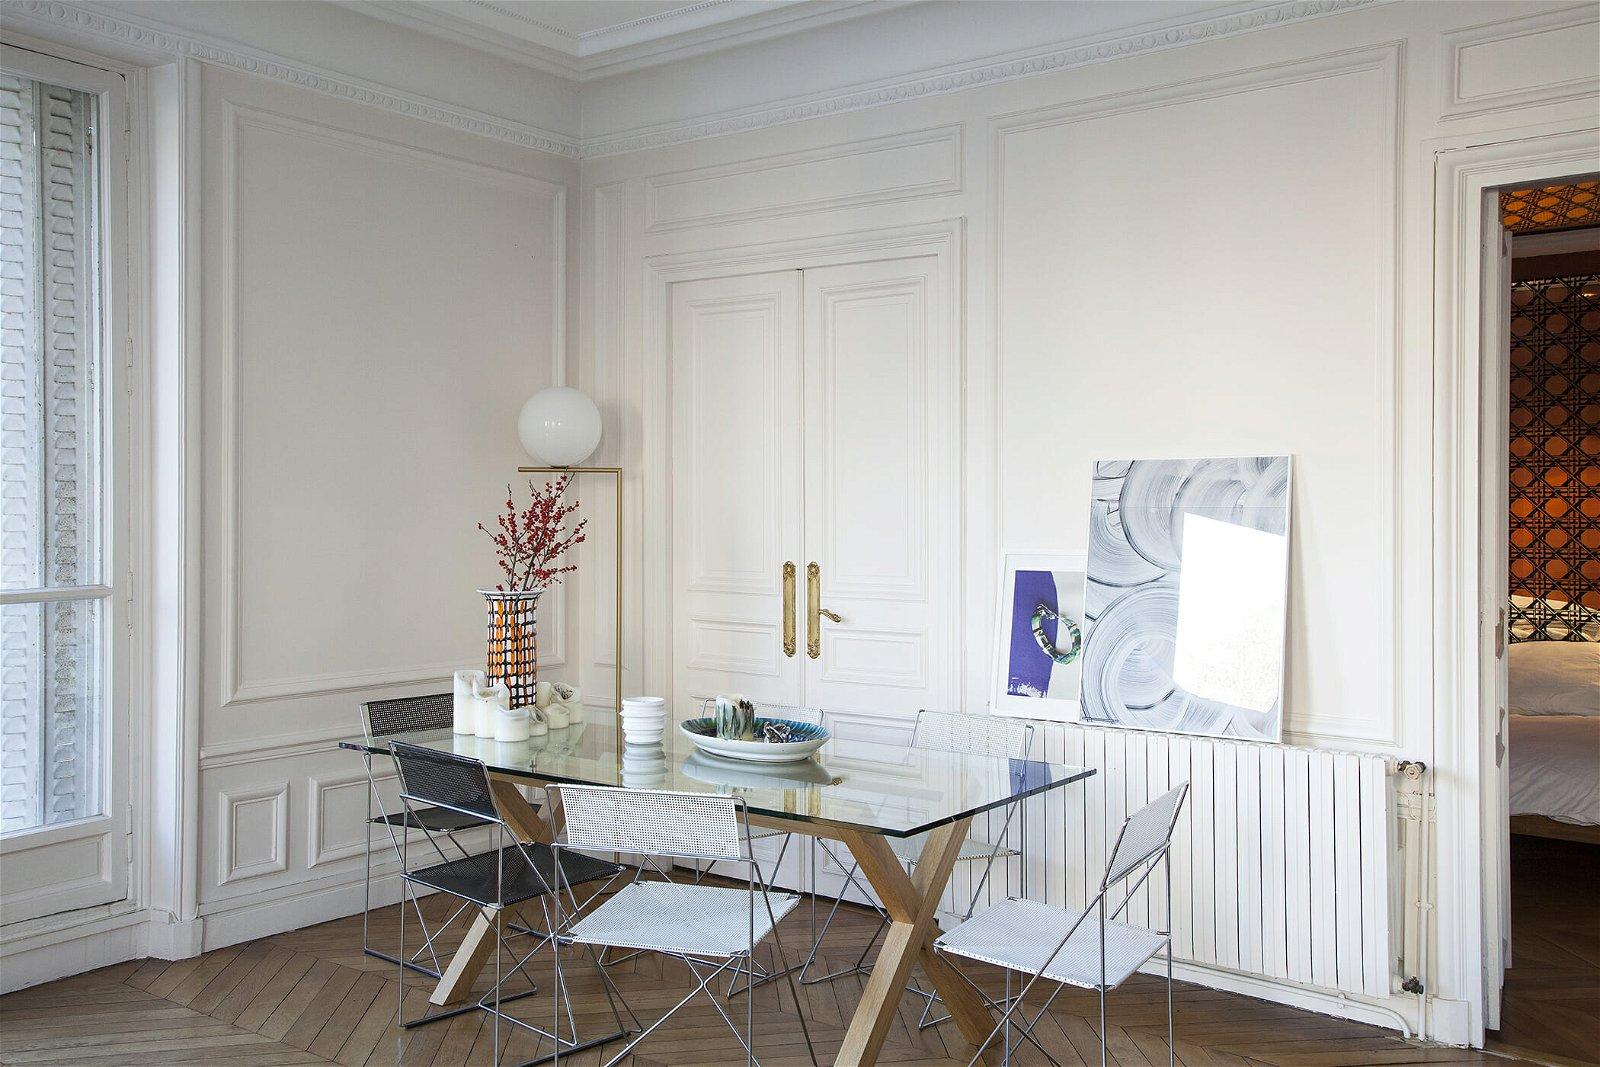 Annelise-michelson-apartment-man-repeller_7575.jpg